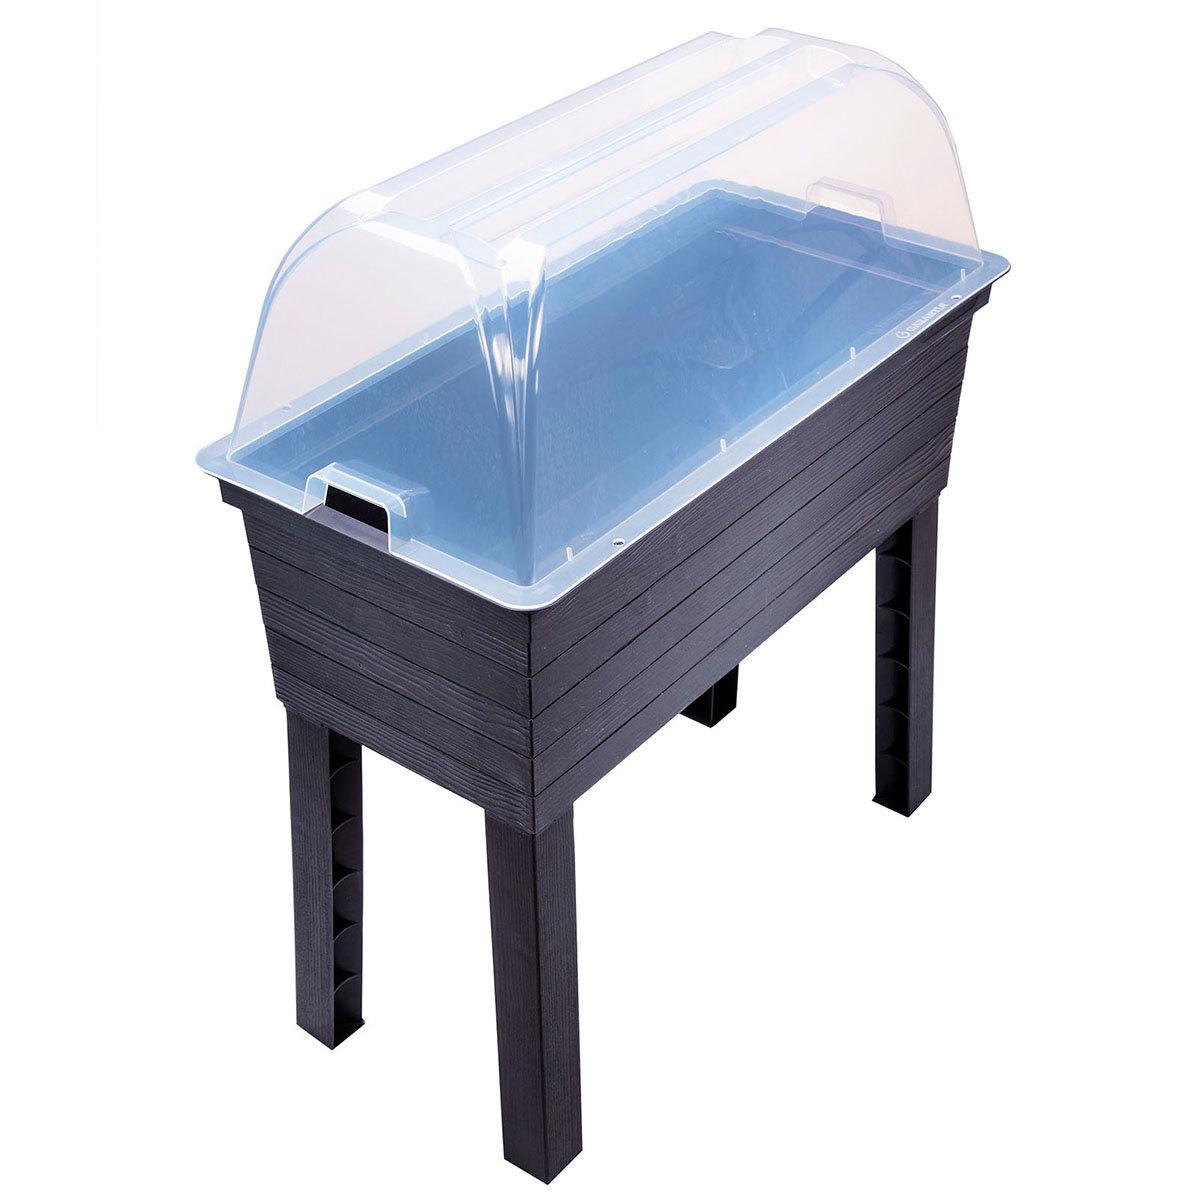 Garantia Urban Balkon Hochbeet Inkl Anzuchthaube Kunststoff